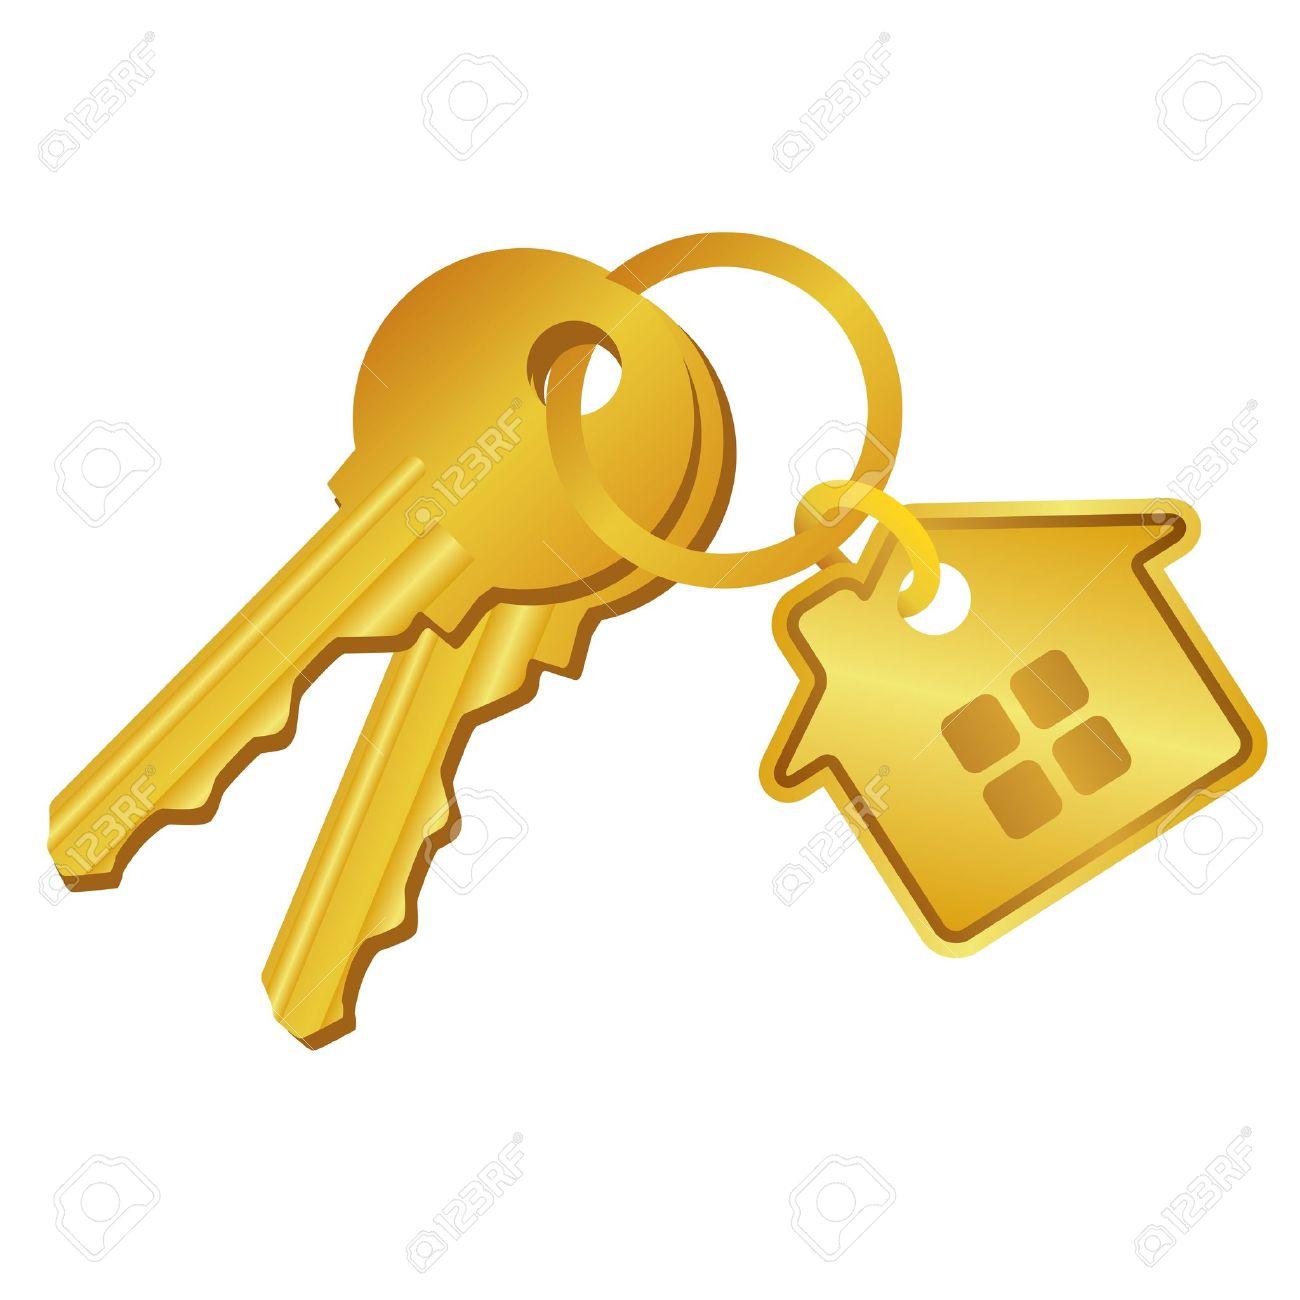 house key  house keys